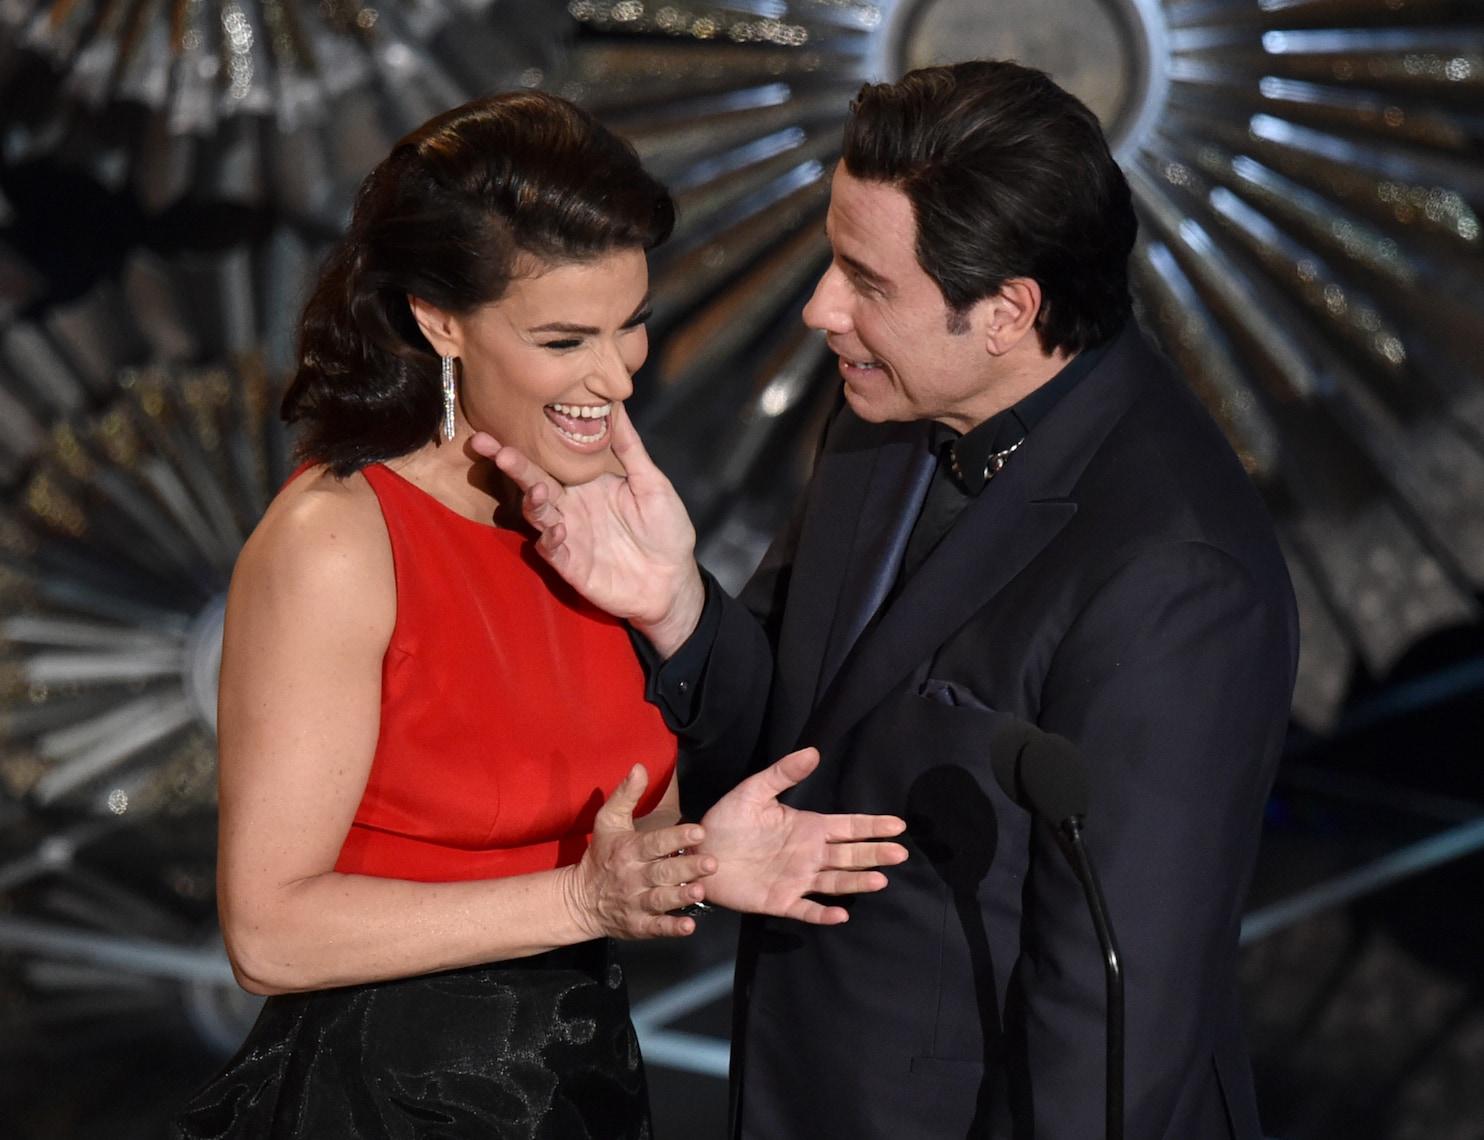 How Did John Travolta Get So Creepy Yet Another Weird